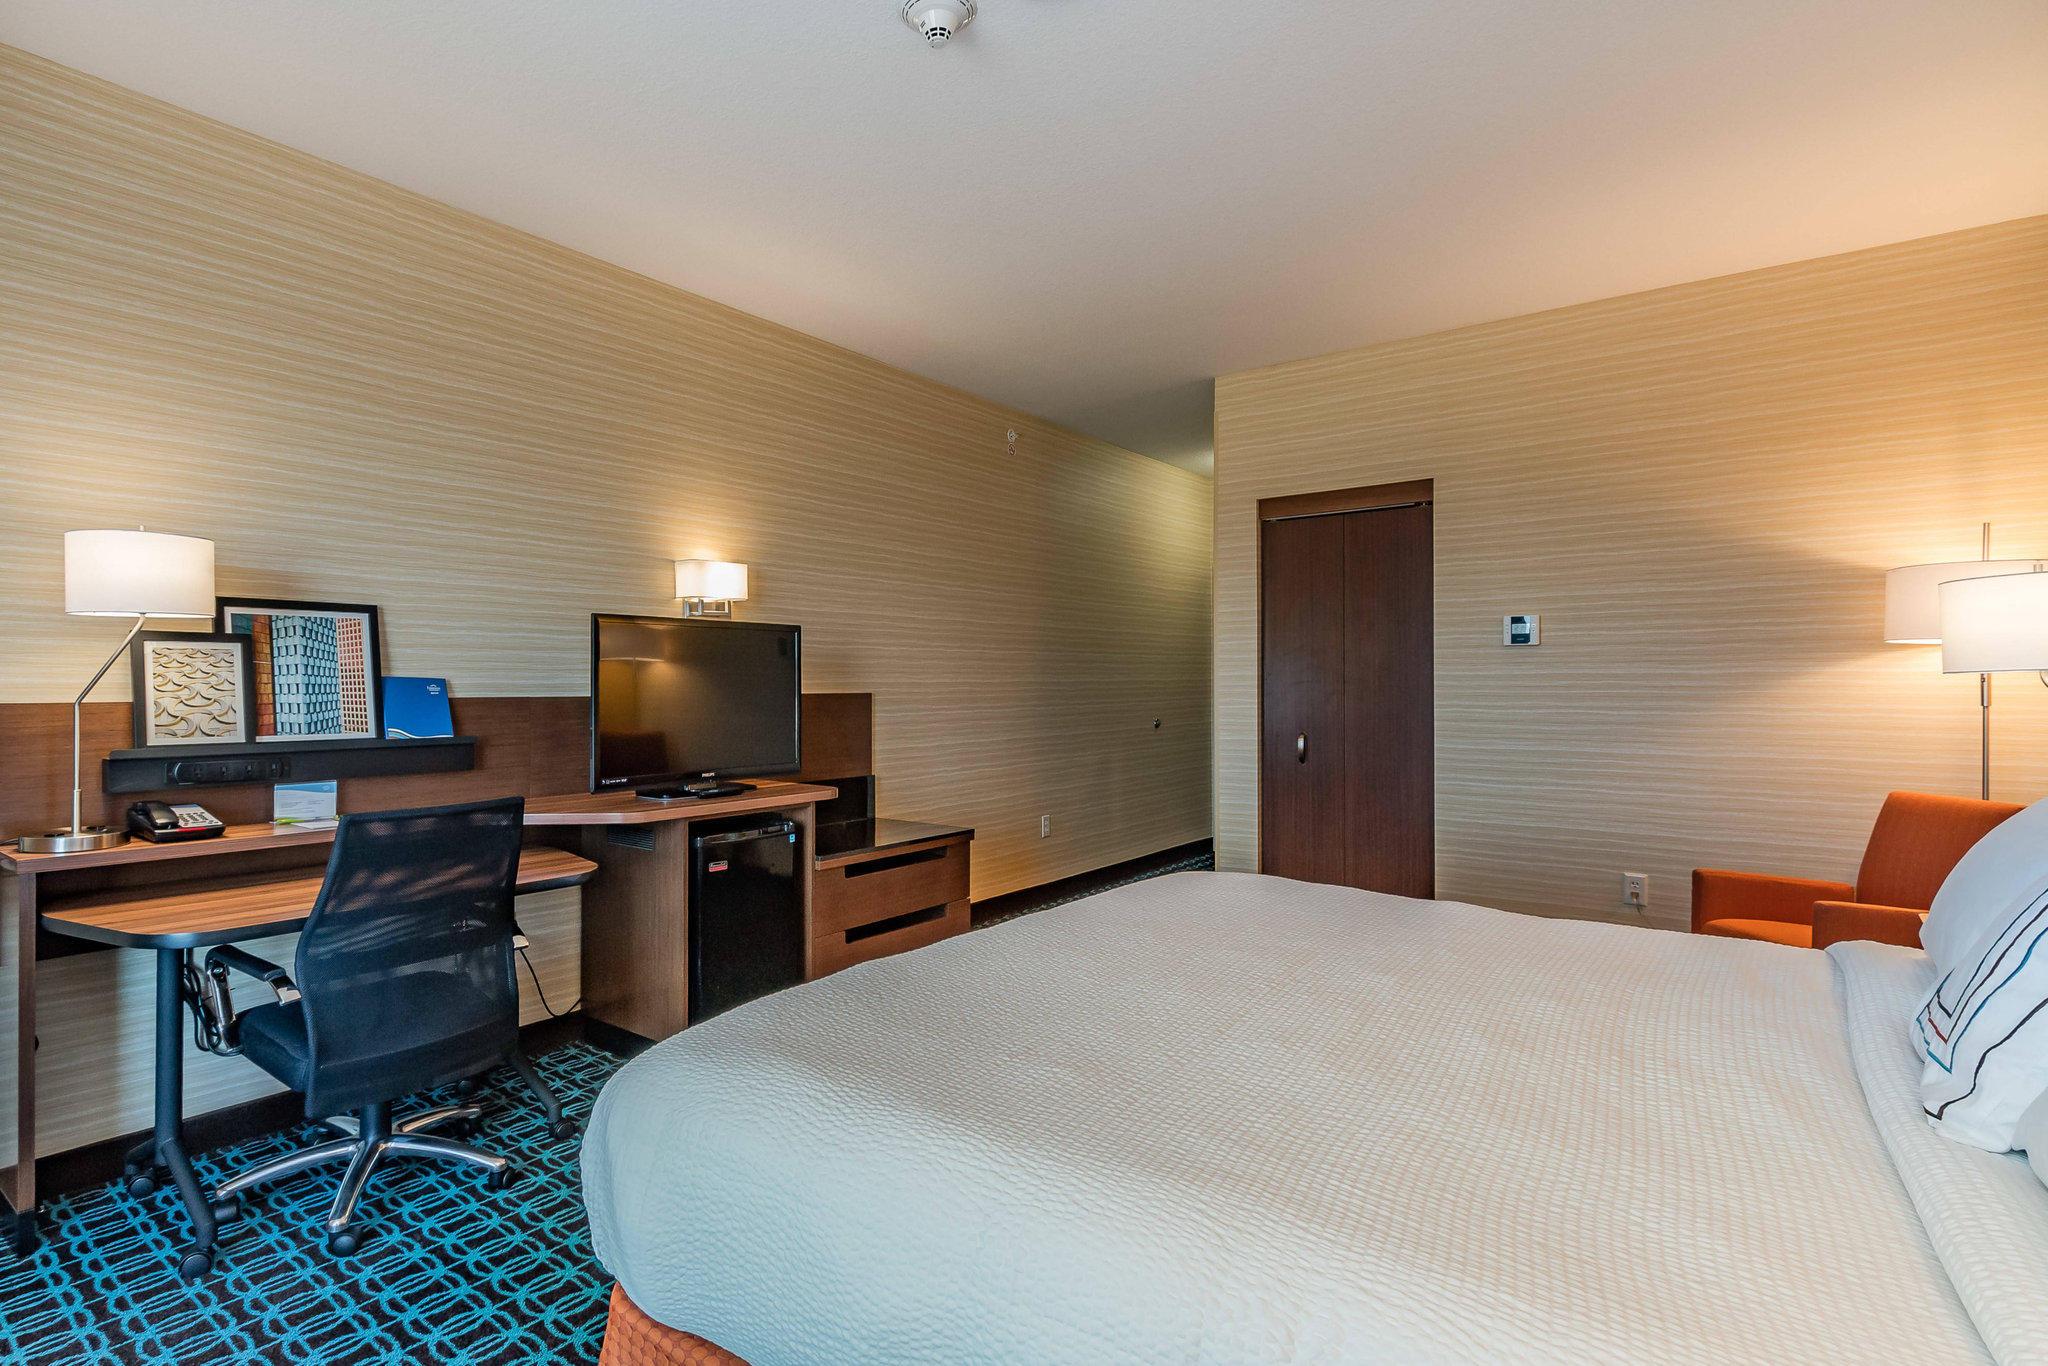 Fairfield Inn & Suites by Marriott Elkhart